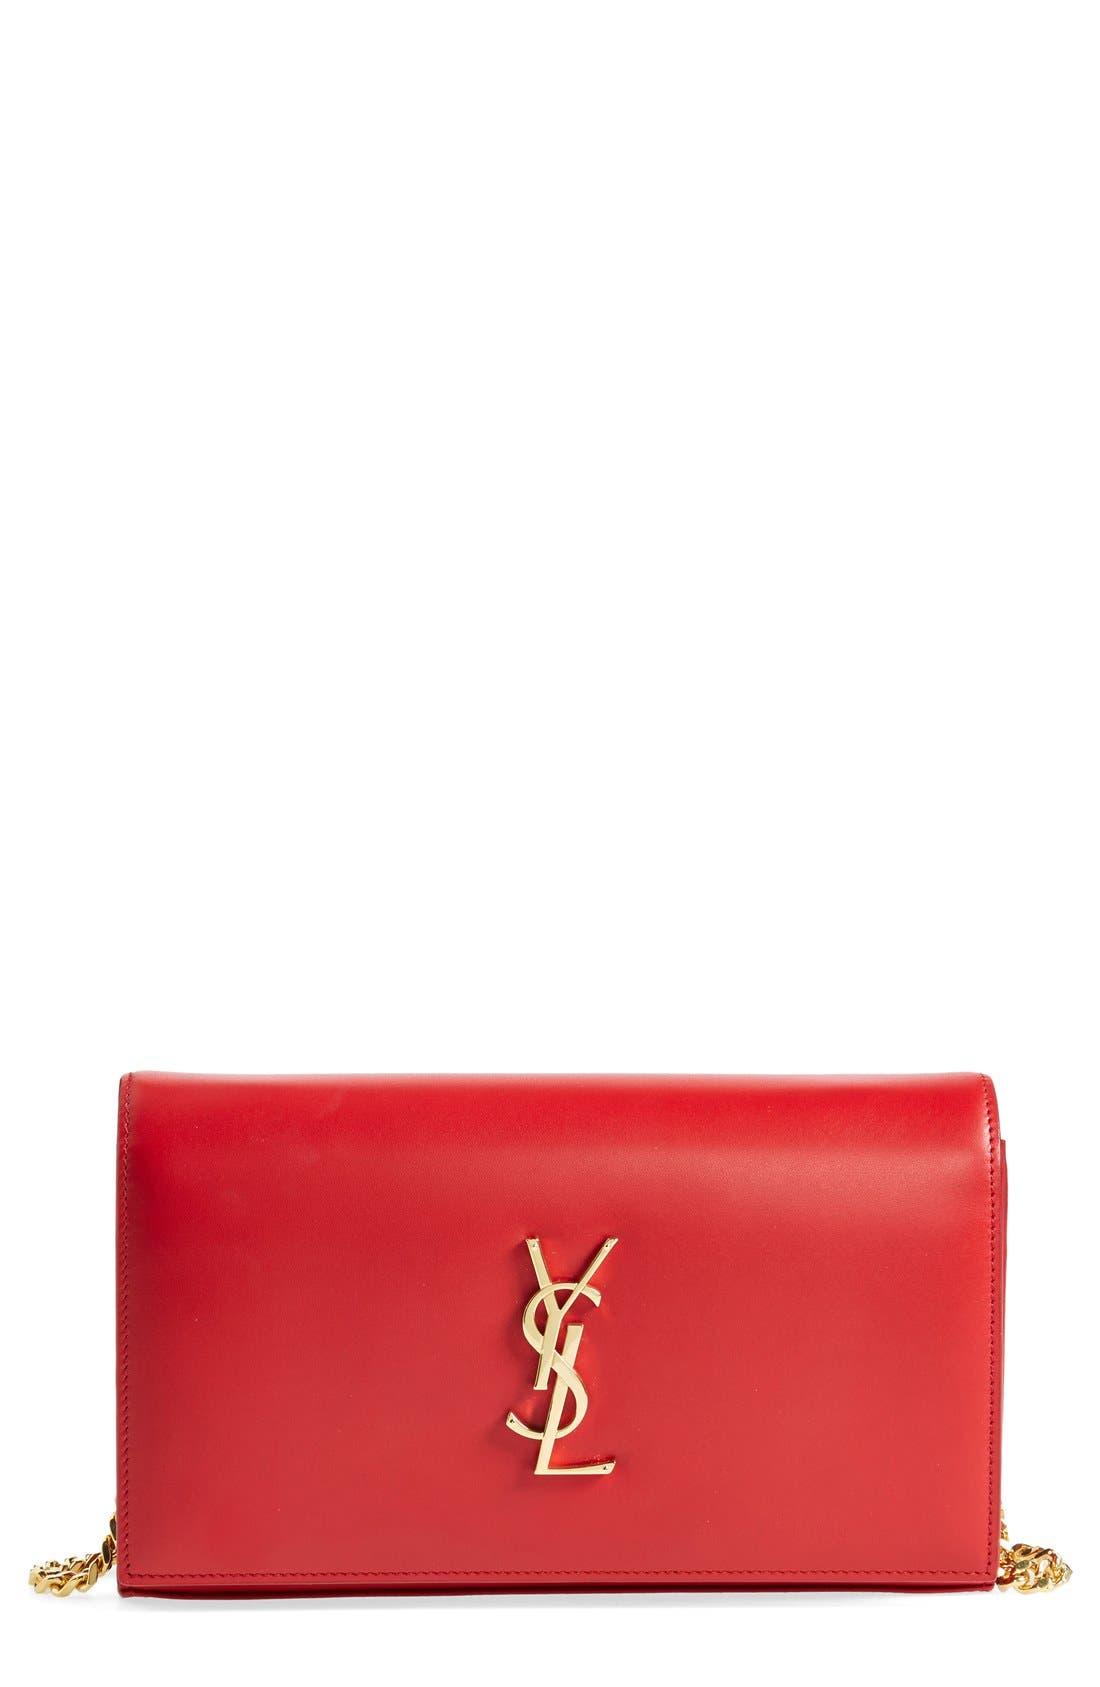 Main Image - Saint Laurent 'Monogram' Leather Wallet on a Chain